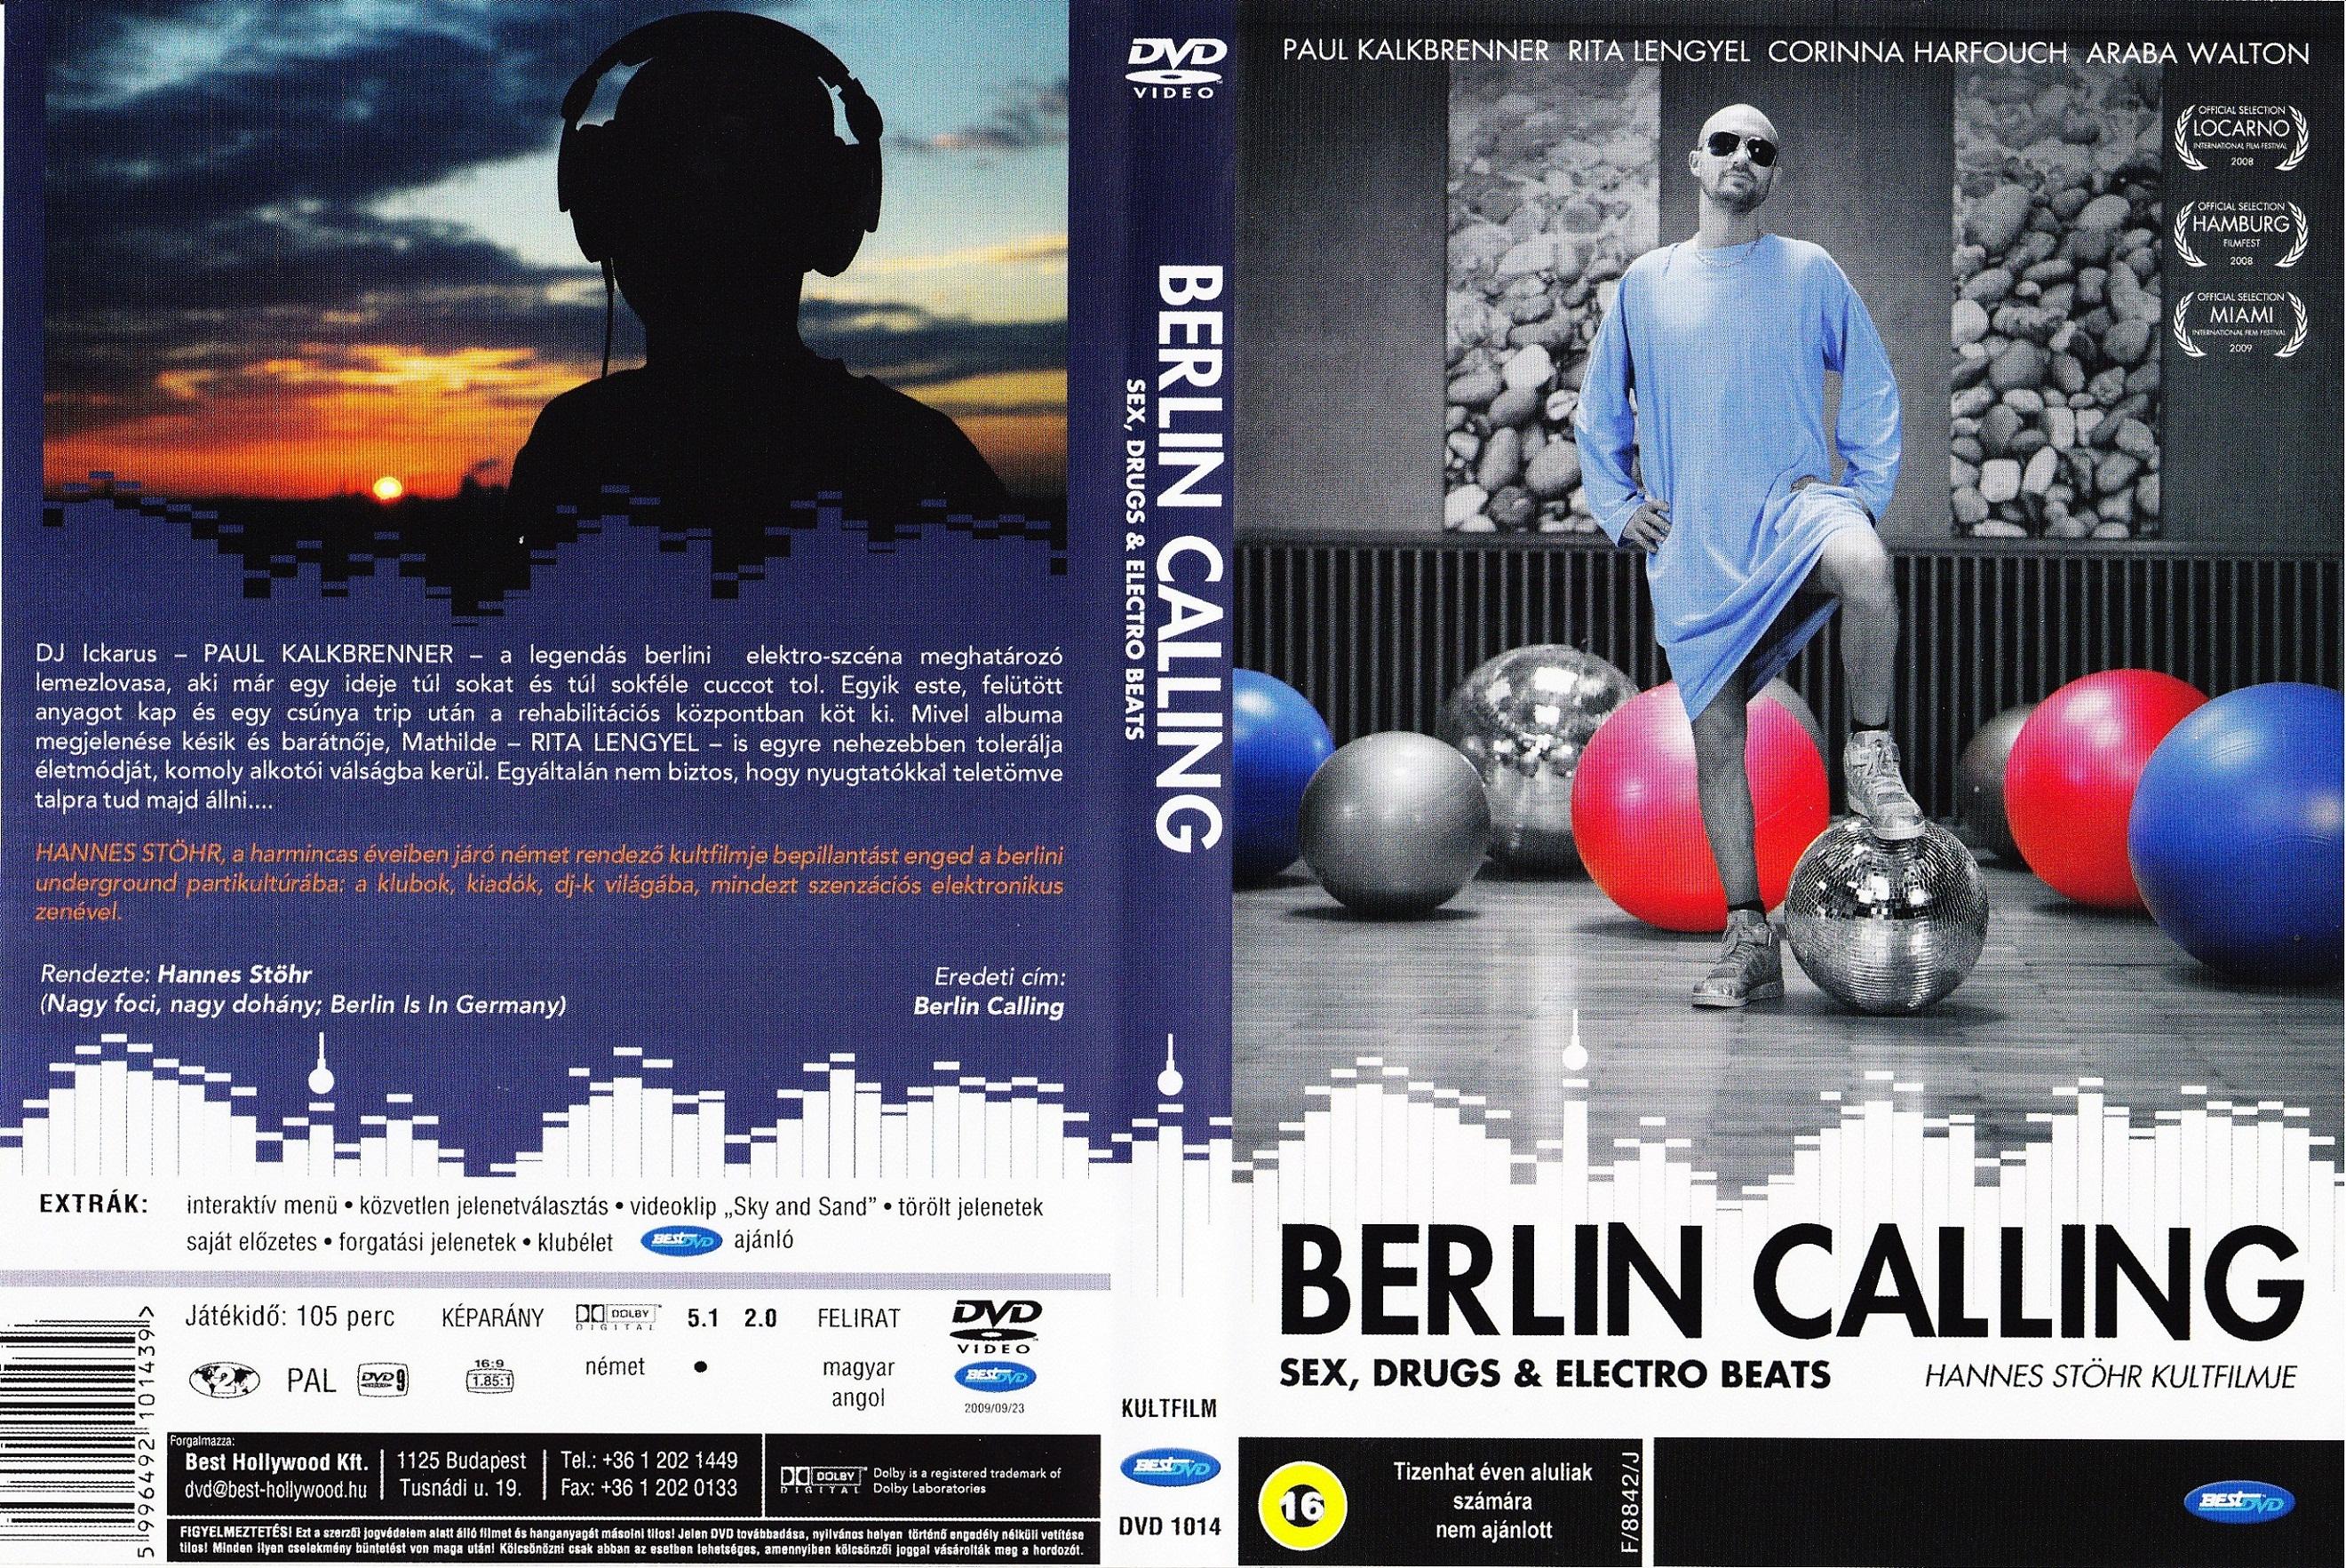 Berlin Calling (2008) okładka